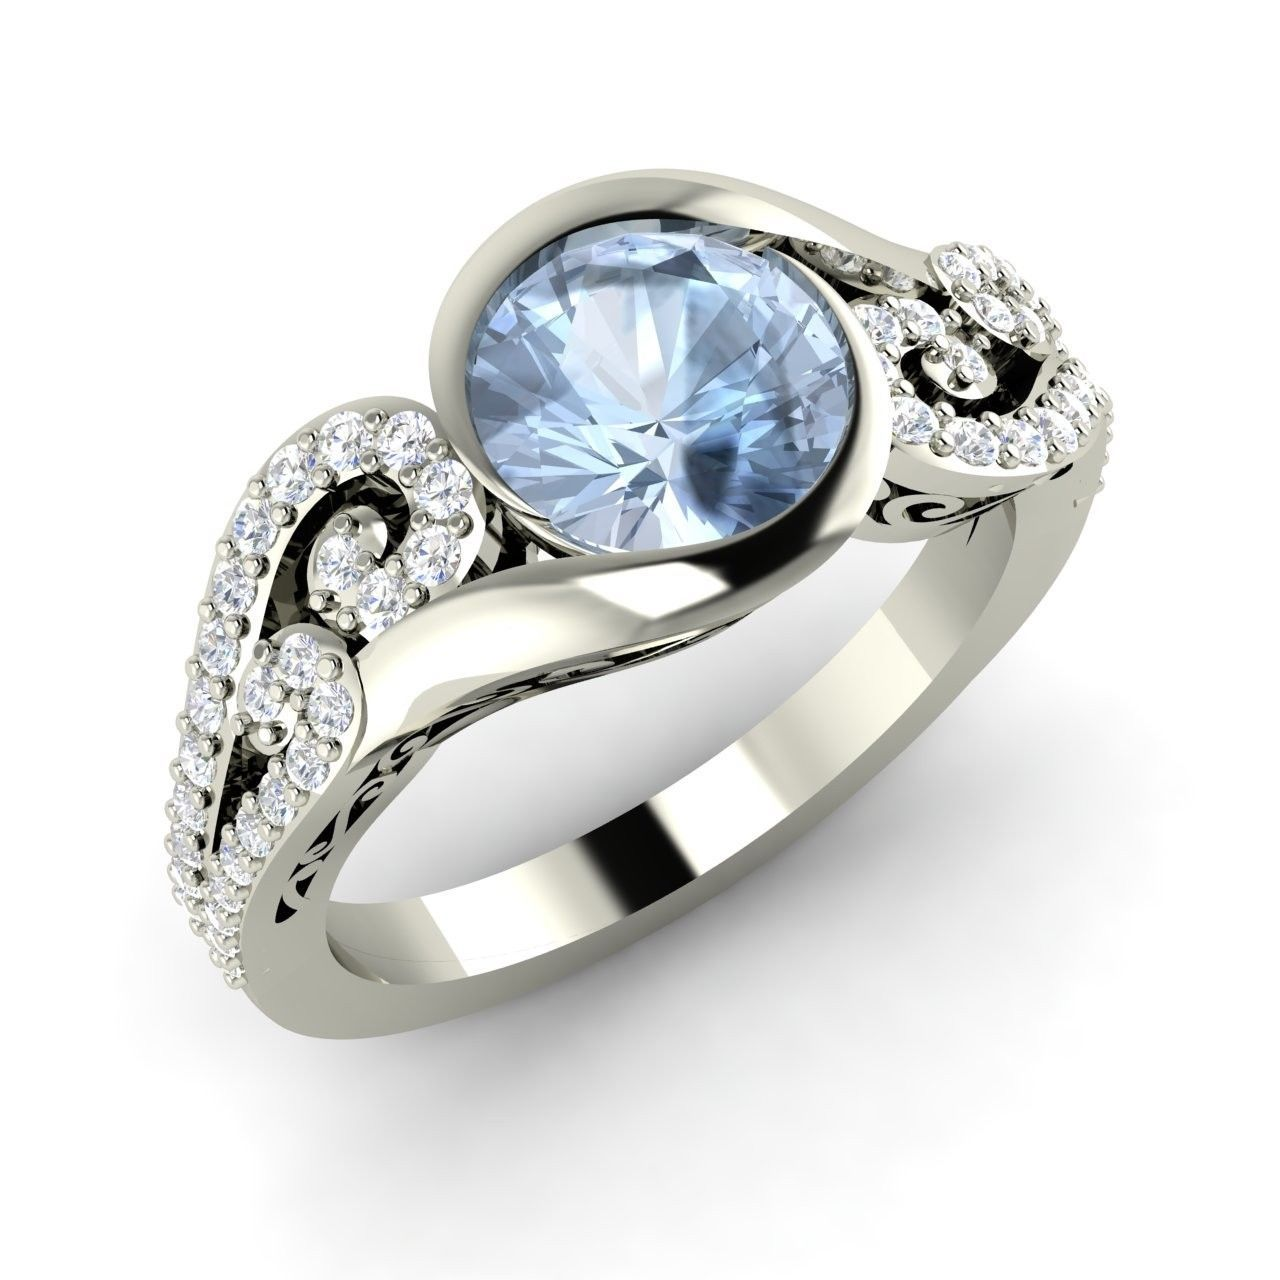 124 Ct Natural Aquamarine Engagement 14k White Gold Ring